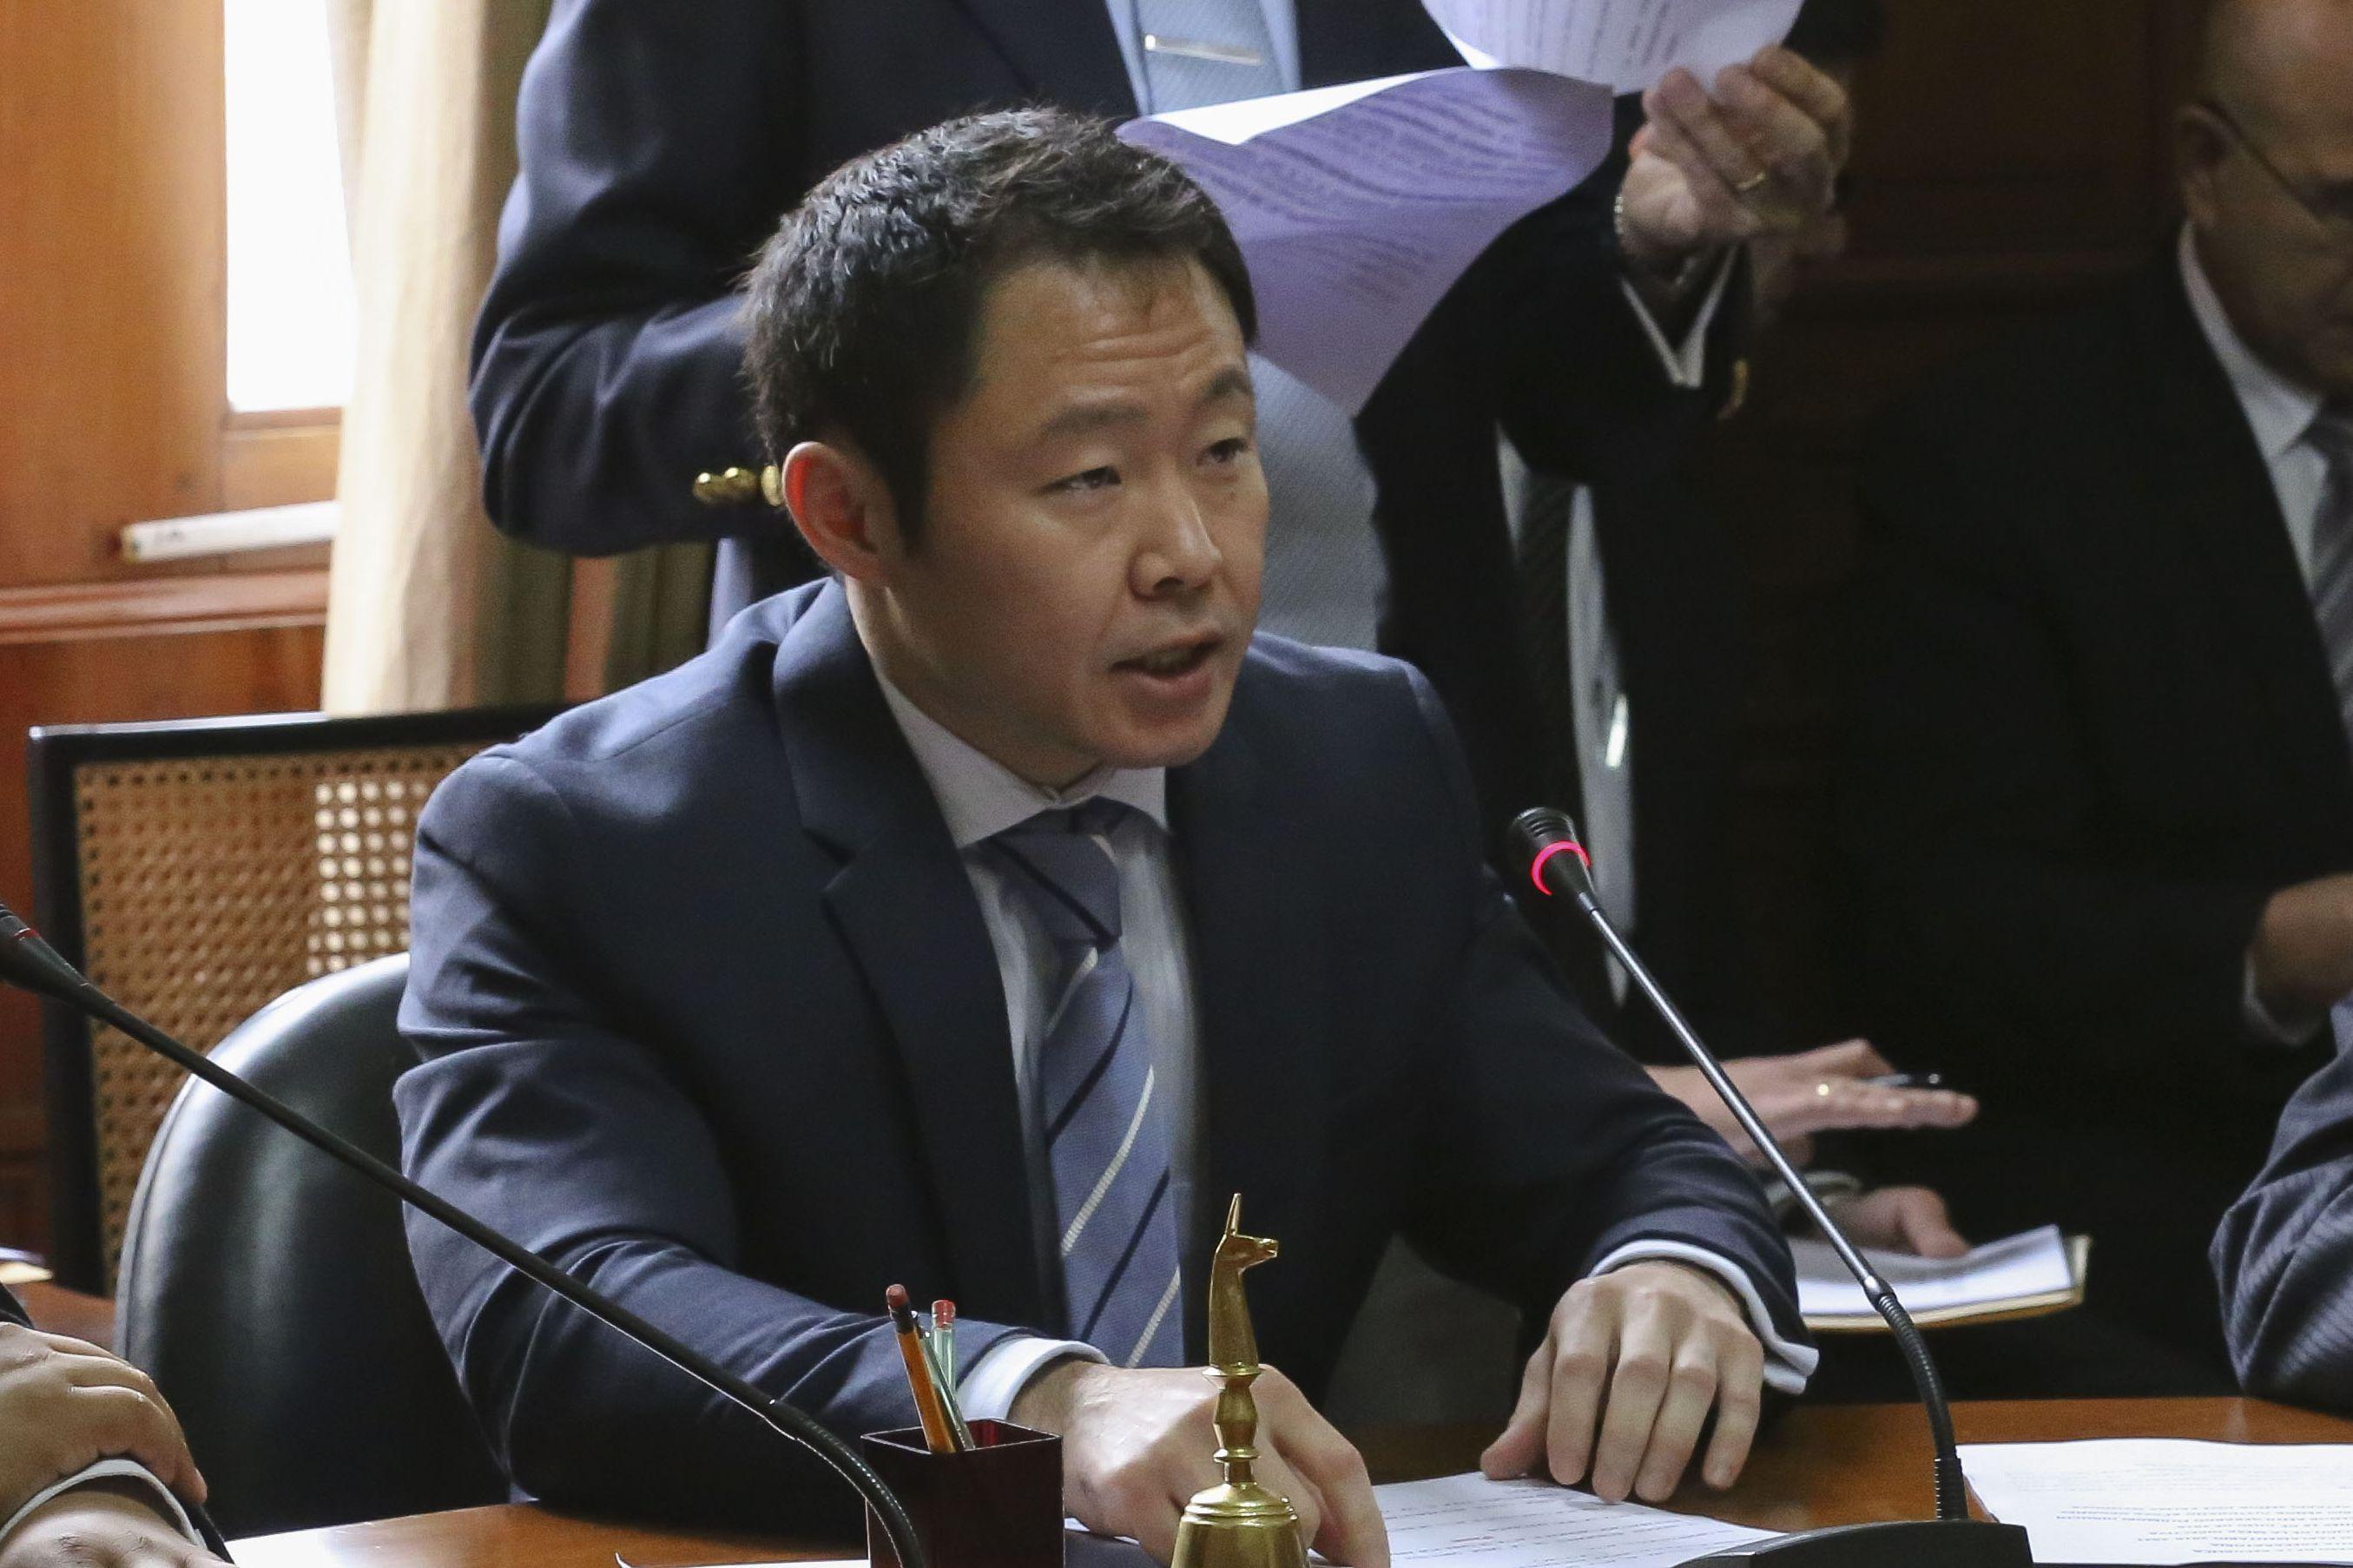 Pleno del Congreso debatirá regreso de Kenji Fujimori antes de terminar la legislatura